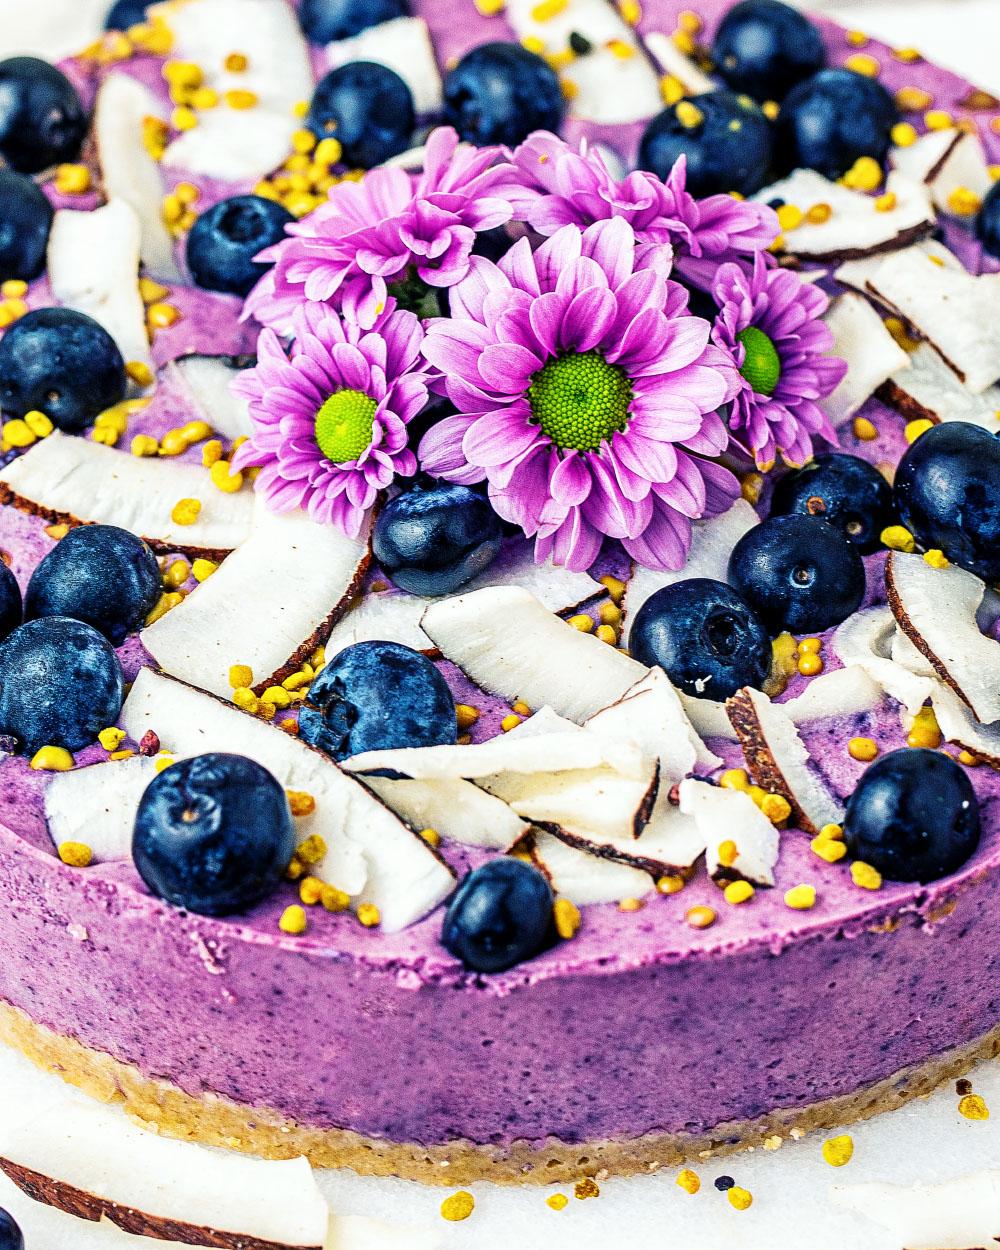 Heidelbeer-Kokos-NoBake-Cheesecake mit Oatsome KaeptnBlaubeer vegan einfaches Rezept